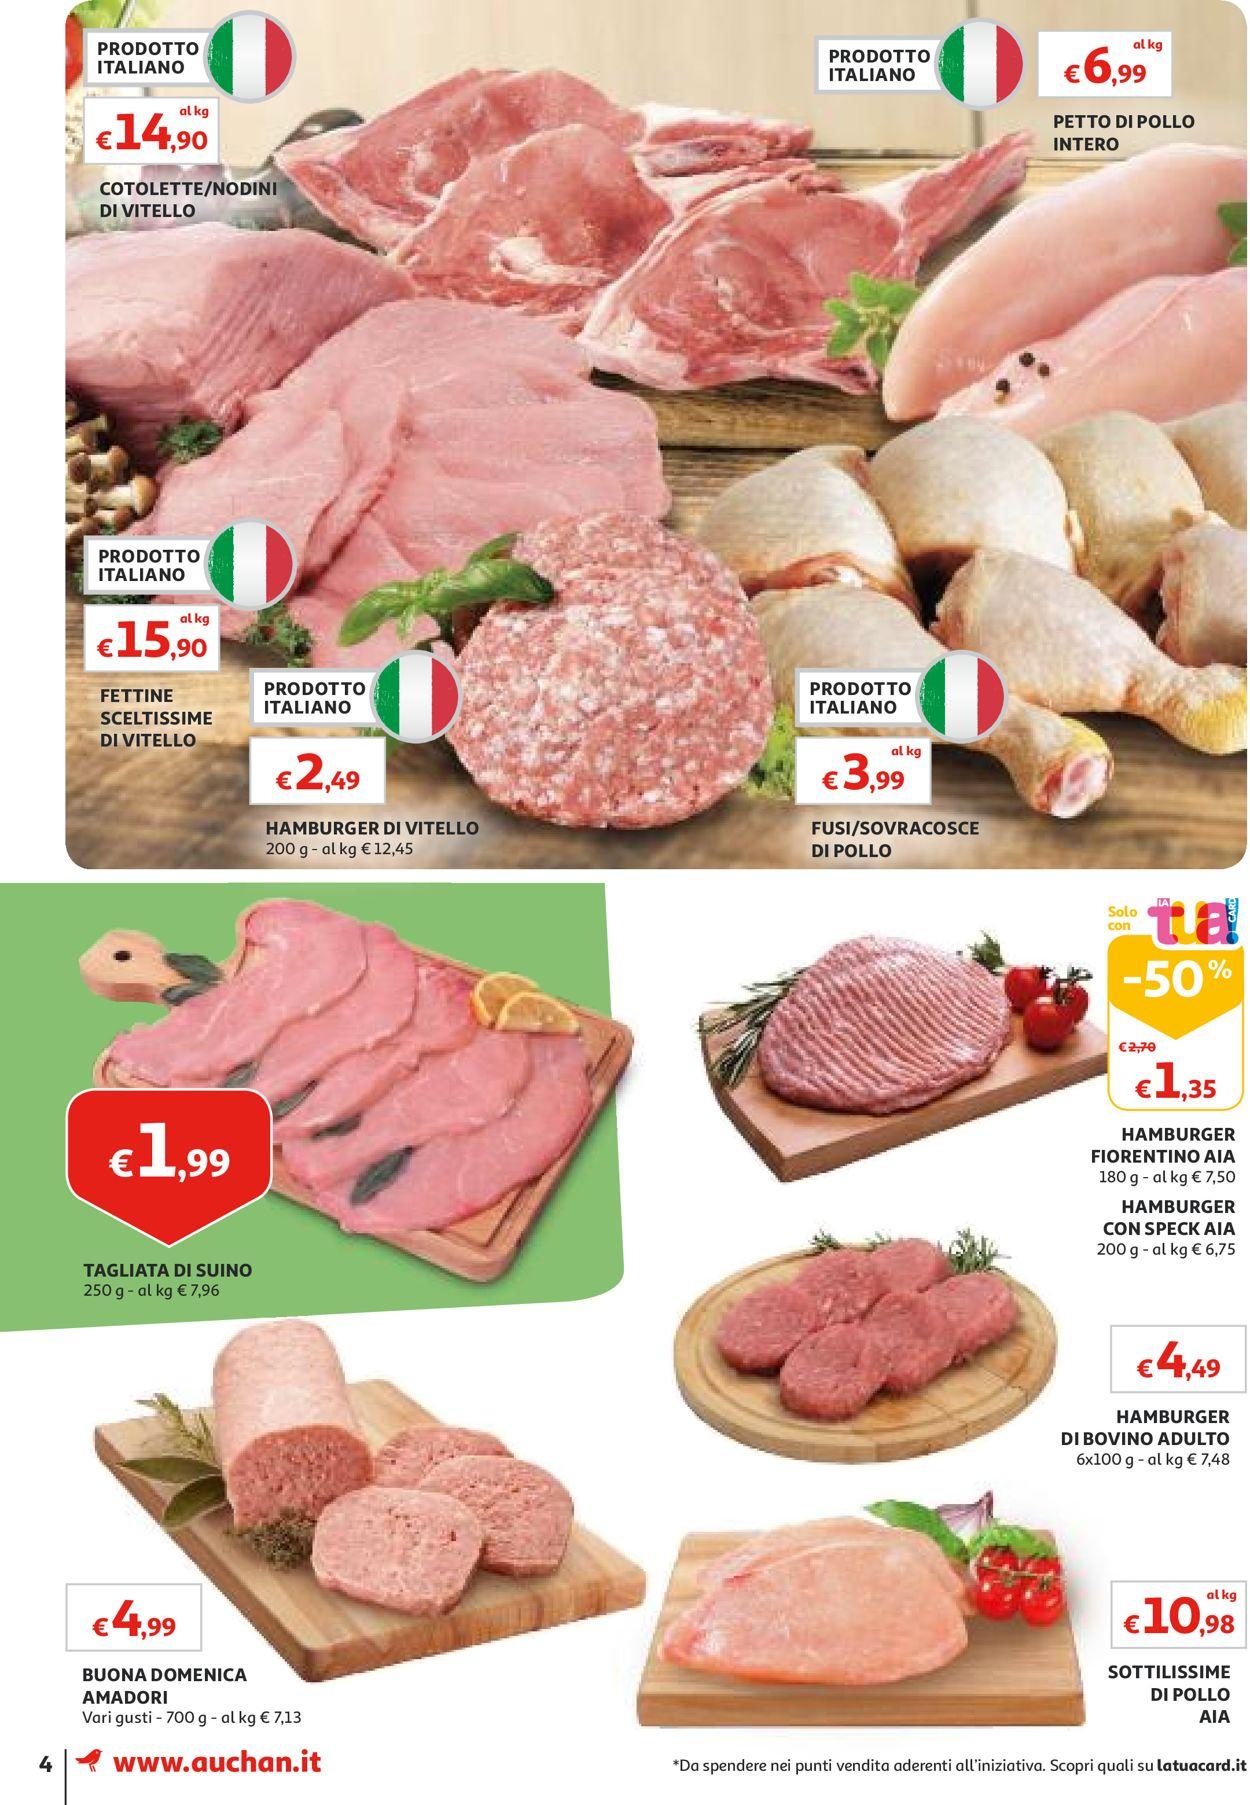 Volantino Auchan - Offerte 01/08-08/08/2019 (Pagina 4)